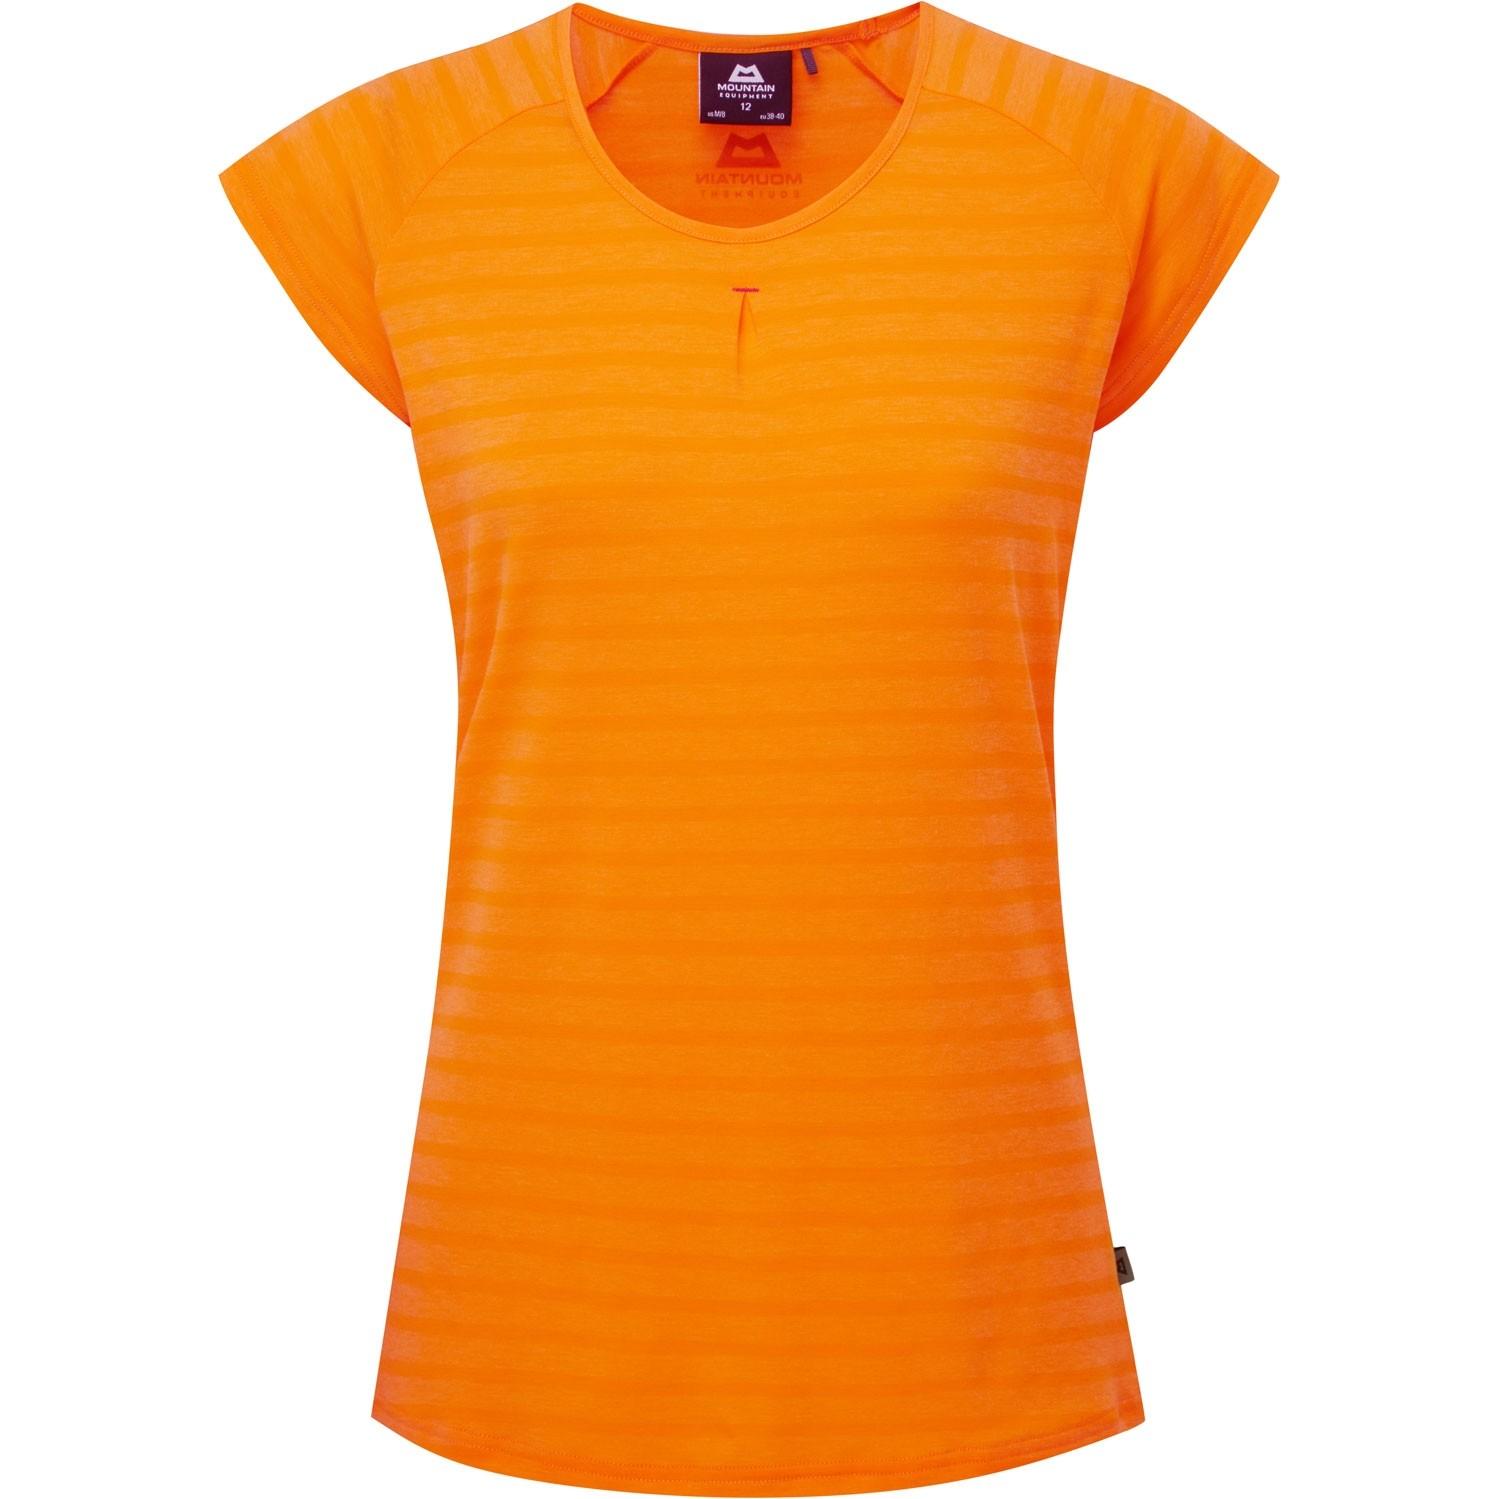 Mountain Equipment Women's Equinox Tee - Orange Sherbet Stripe